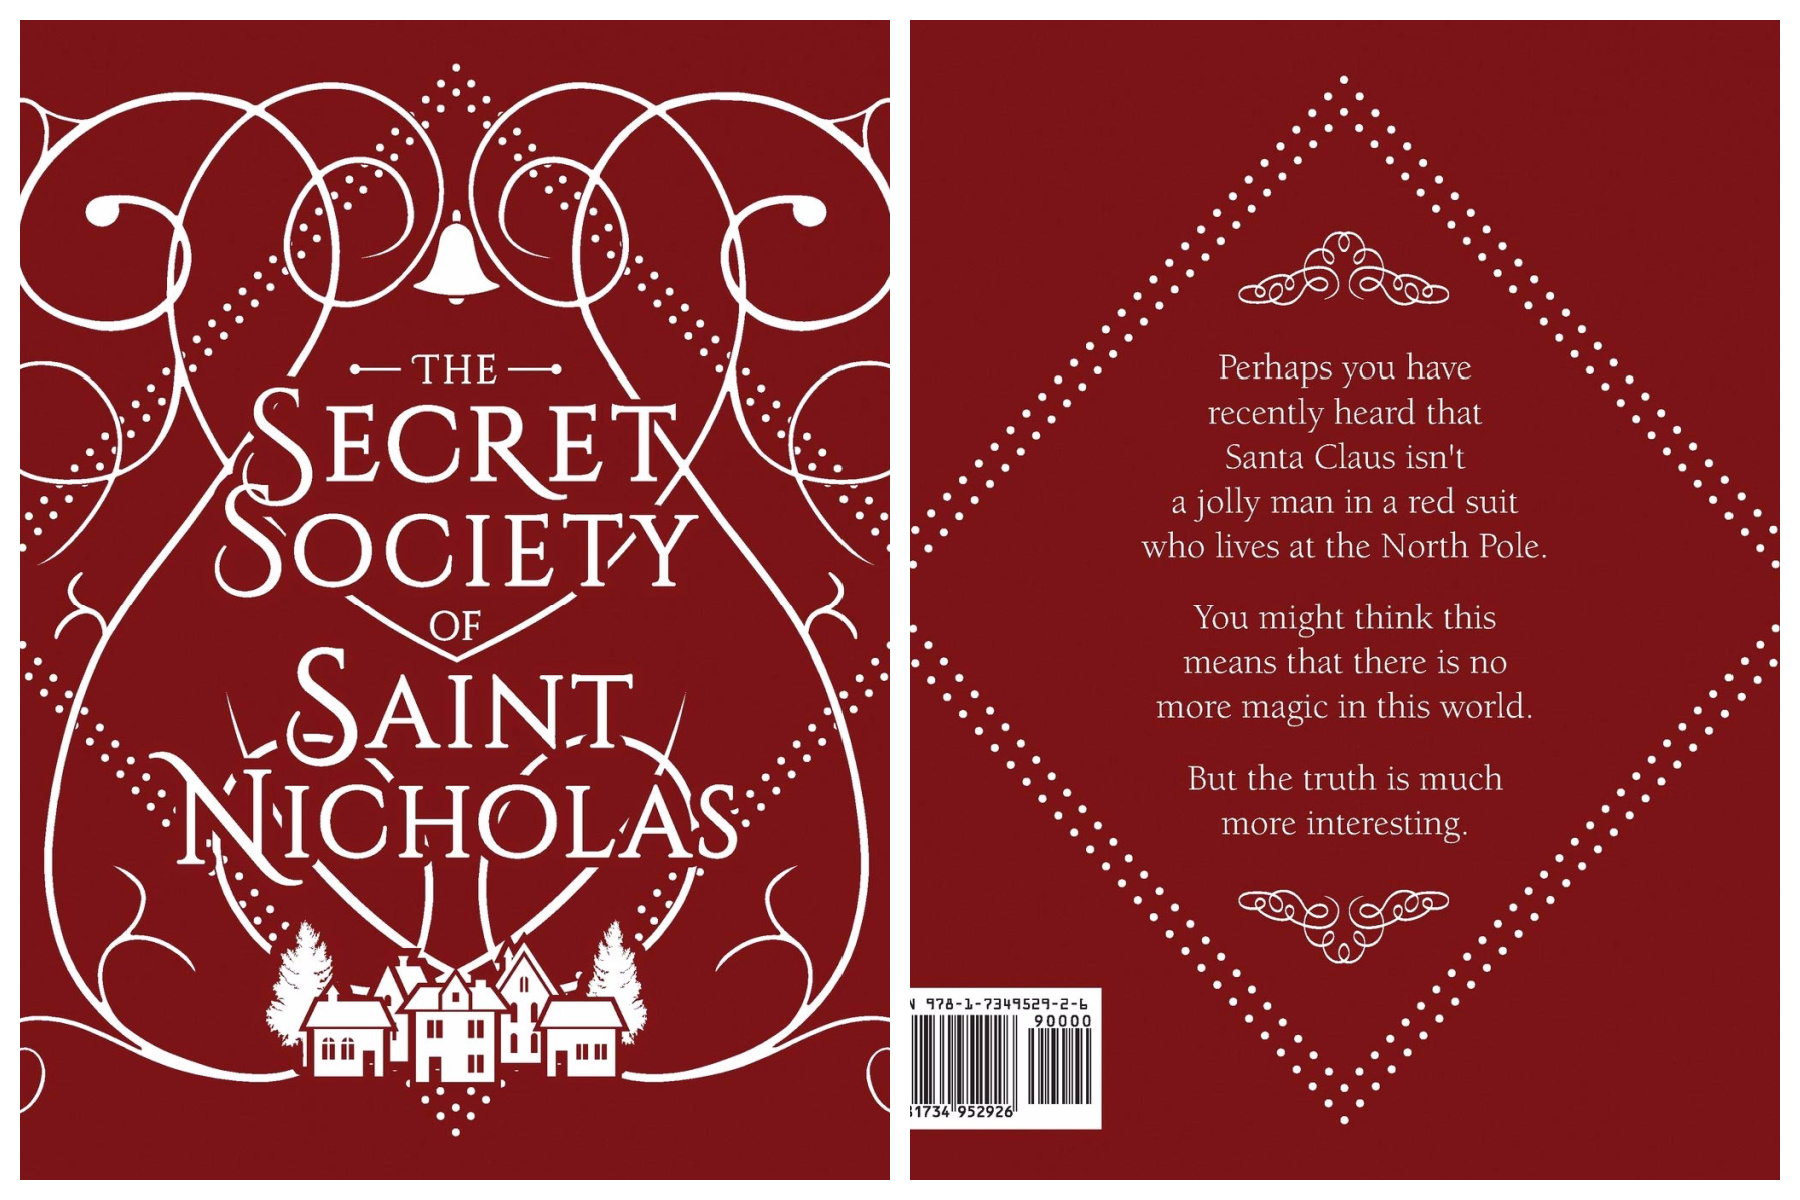 Secret Society of Saint Nicholas